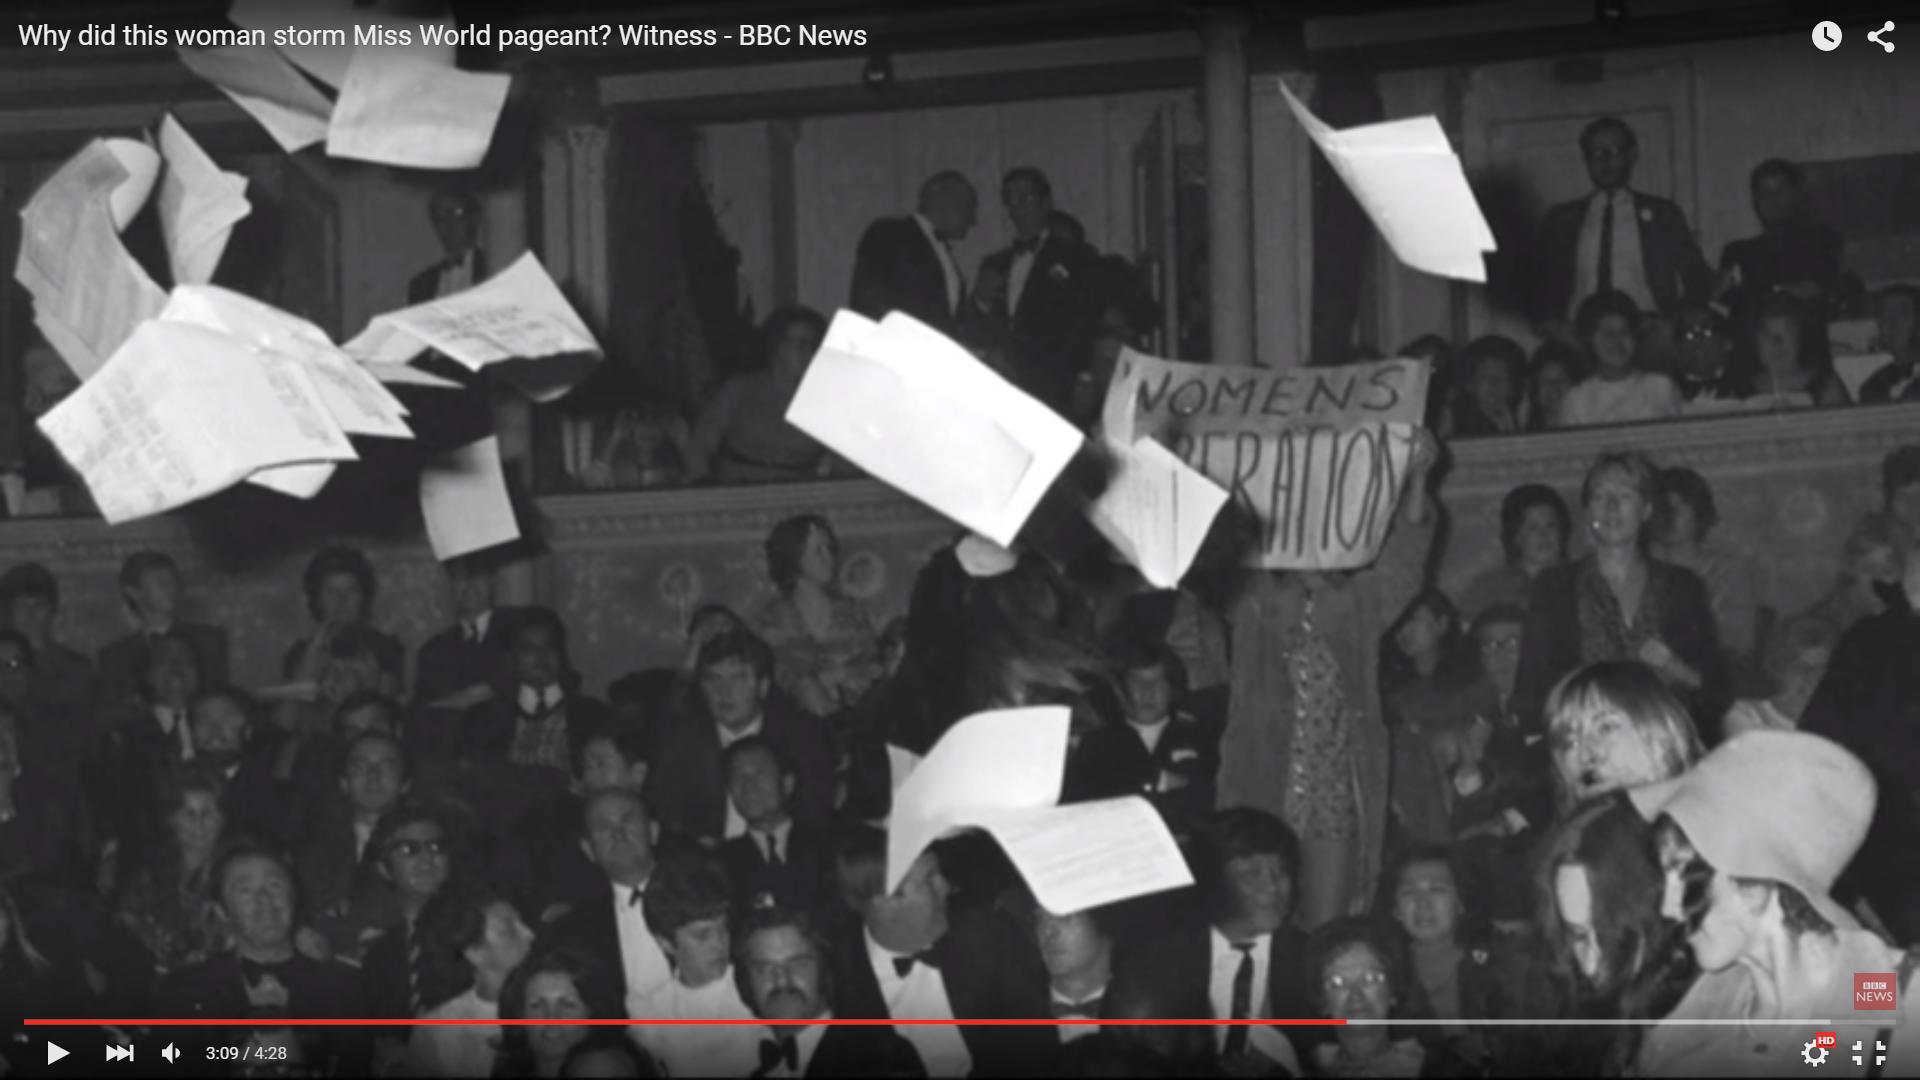 Miss World 1970 disruption BBC News